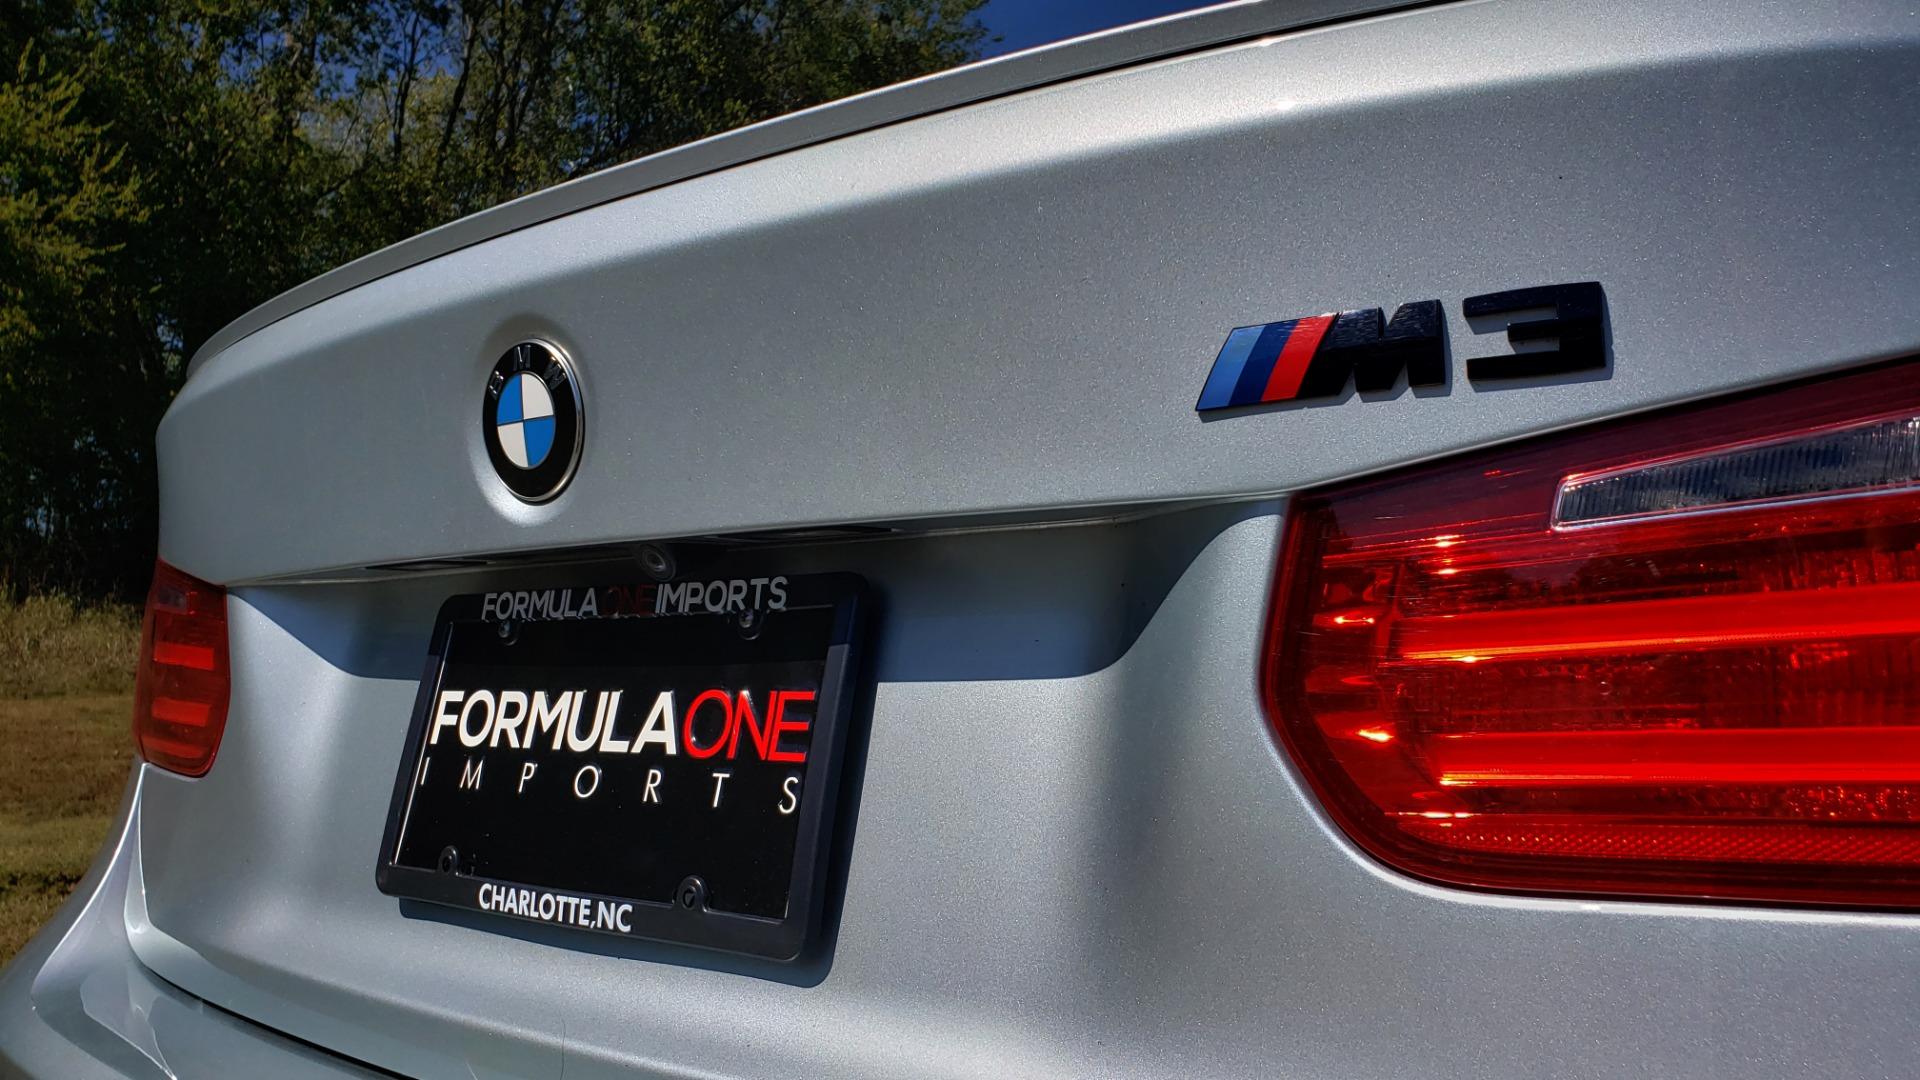 Used 2015 BMW M3 EXECUTIVE PKG / NAV / CAMERA / HUD / CARBON FIBER ROOF for sale Sold at Formula Imports in Charlotte NC 28227 18